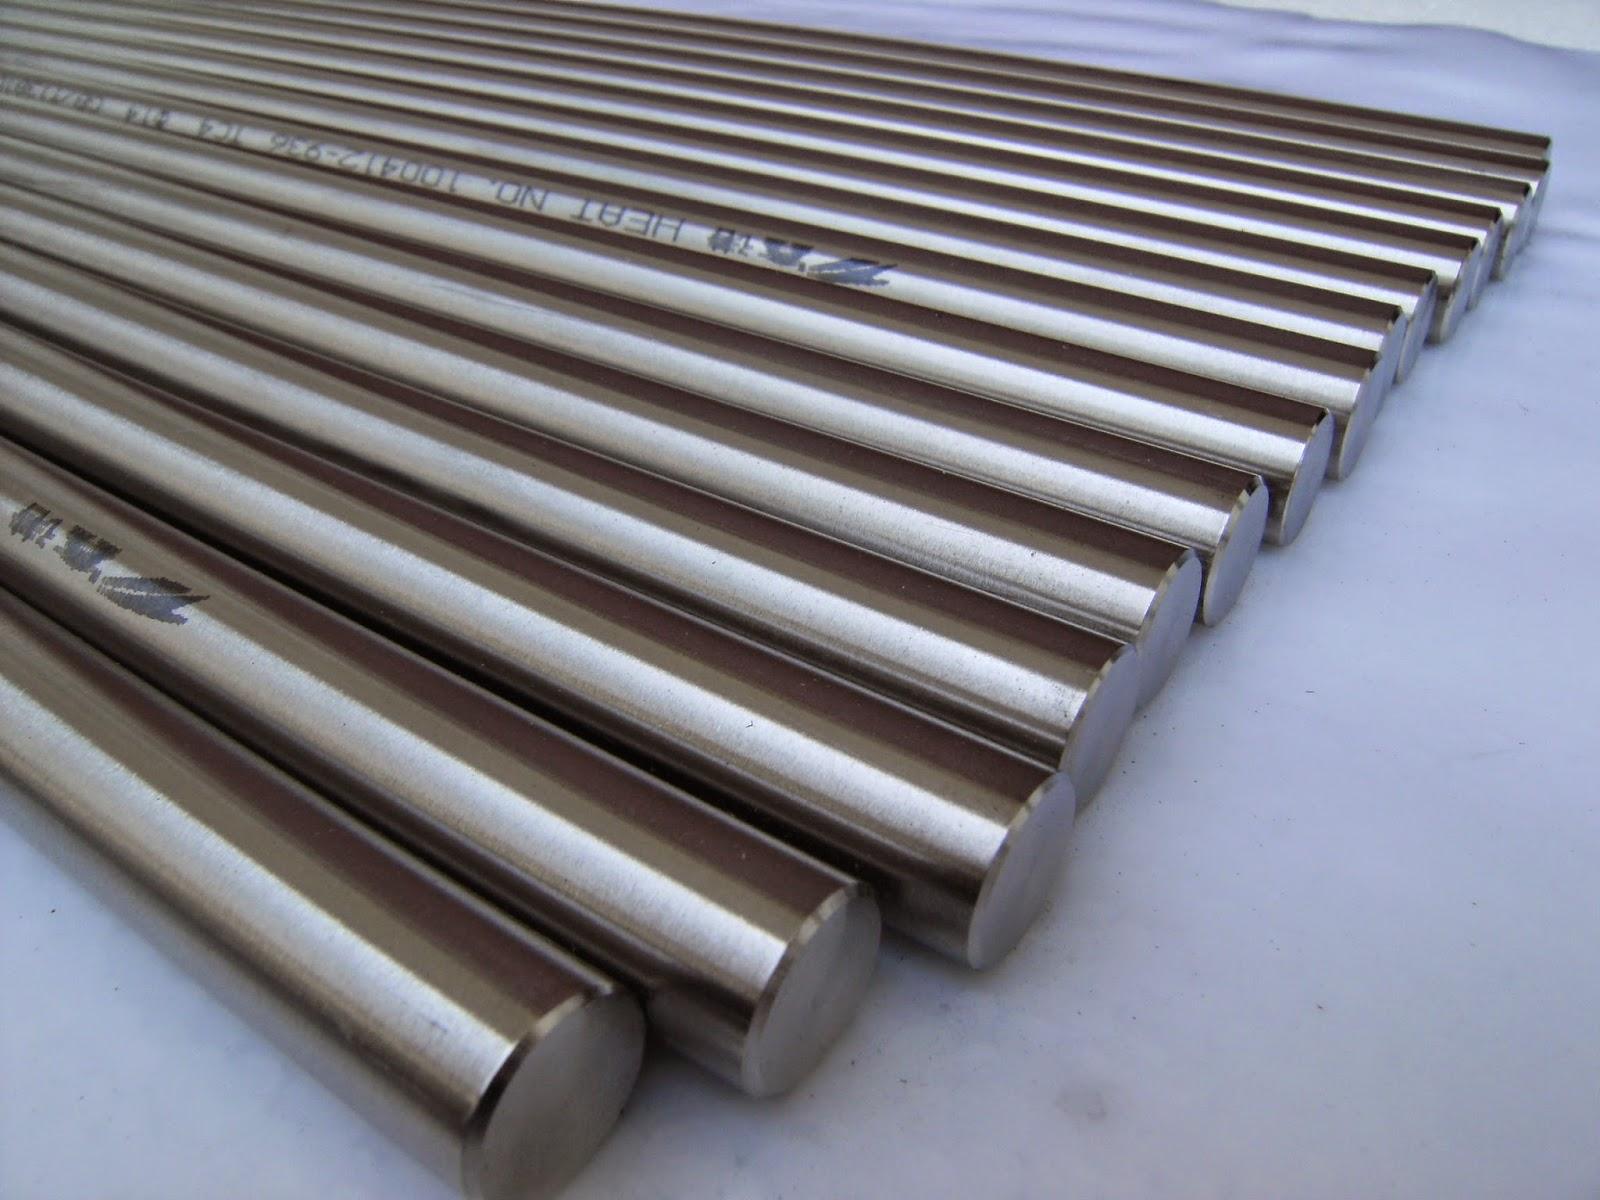 xinnuo grade titanium 1/ 2 /3/ 4 / 5 /7,grade gr 1/ 2 /3/ 4